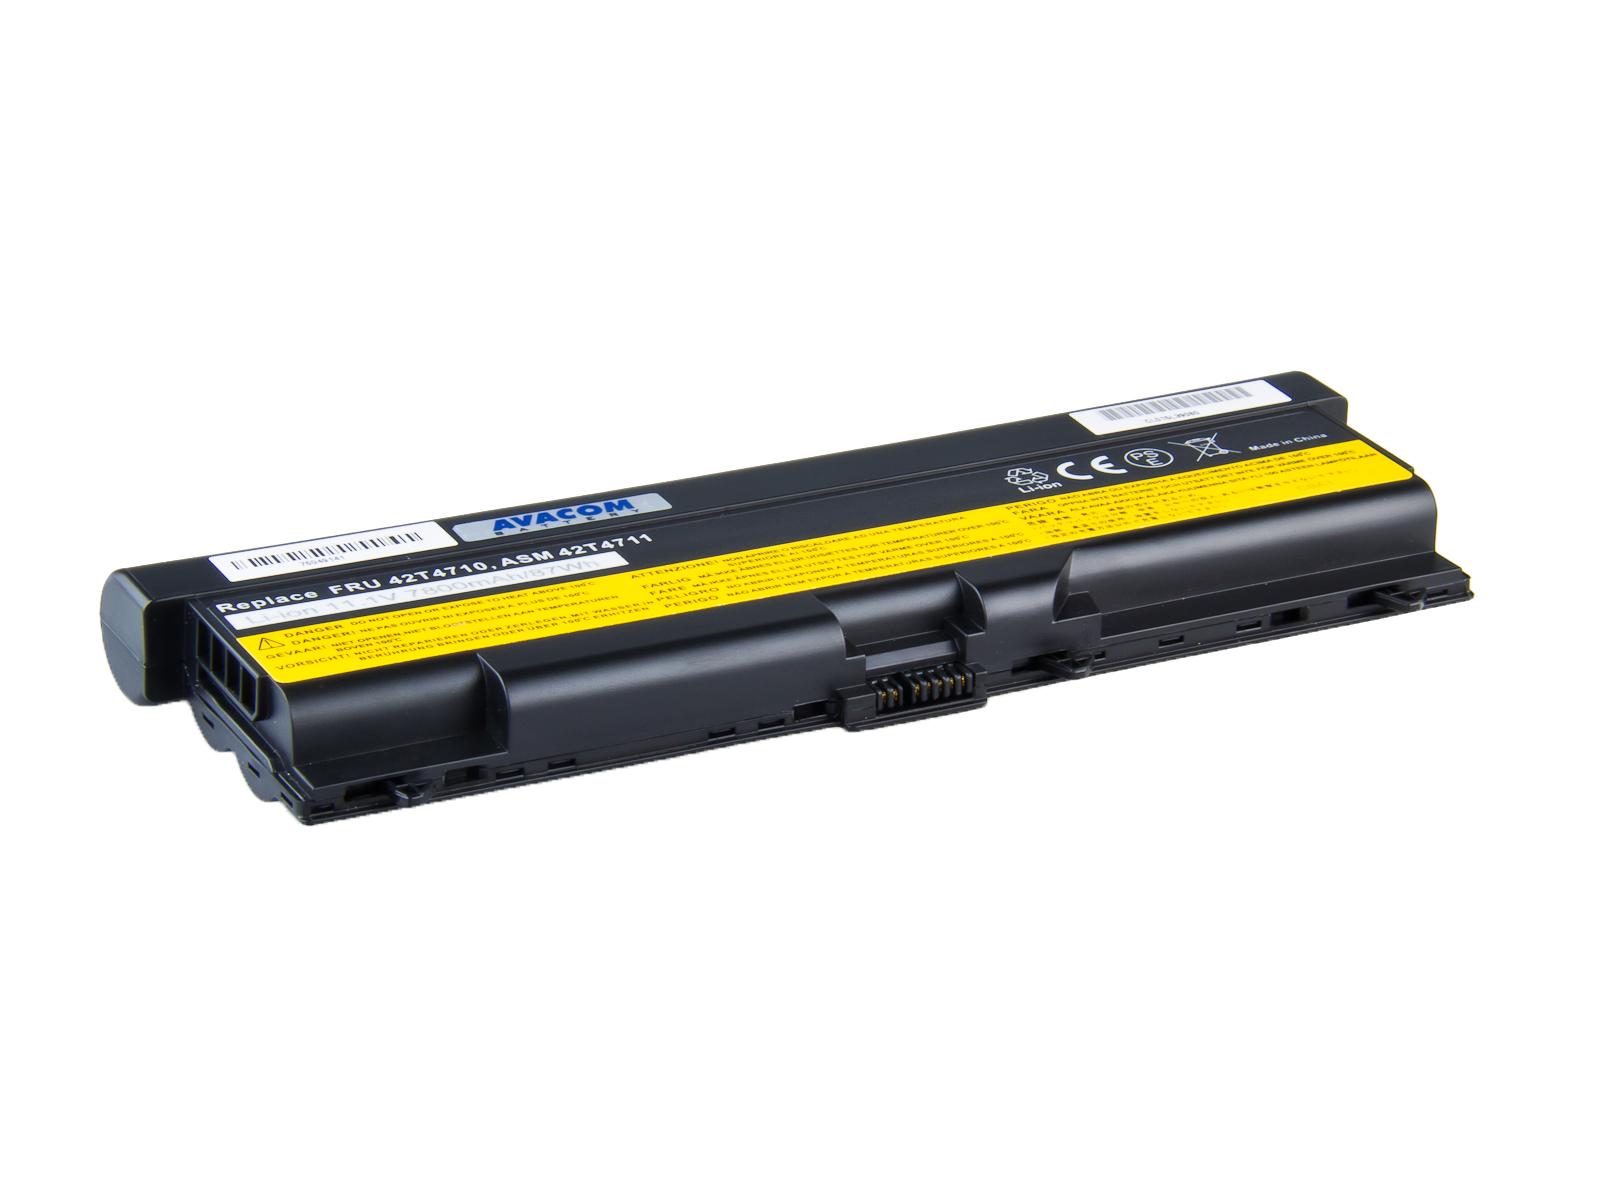 Baterie AVACOM NOLE-SL41H-806 pro Lenovo ThinkPad T410/SL510/Edge 14, 15 Li-Ion 11,1V 7800mAh